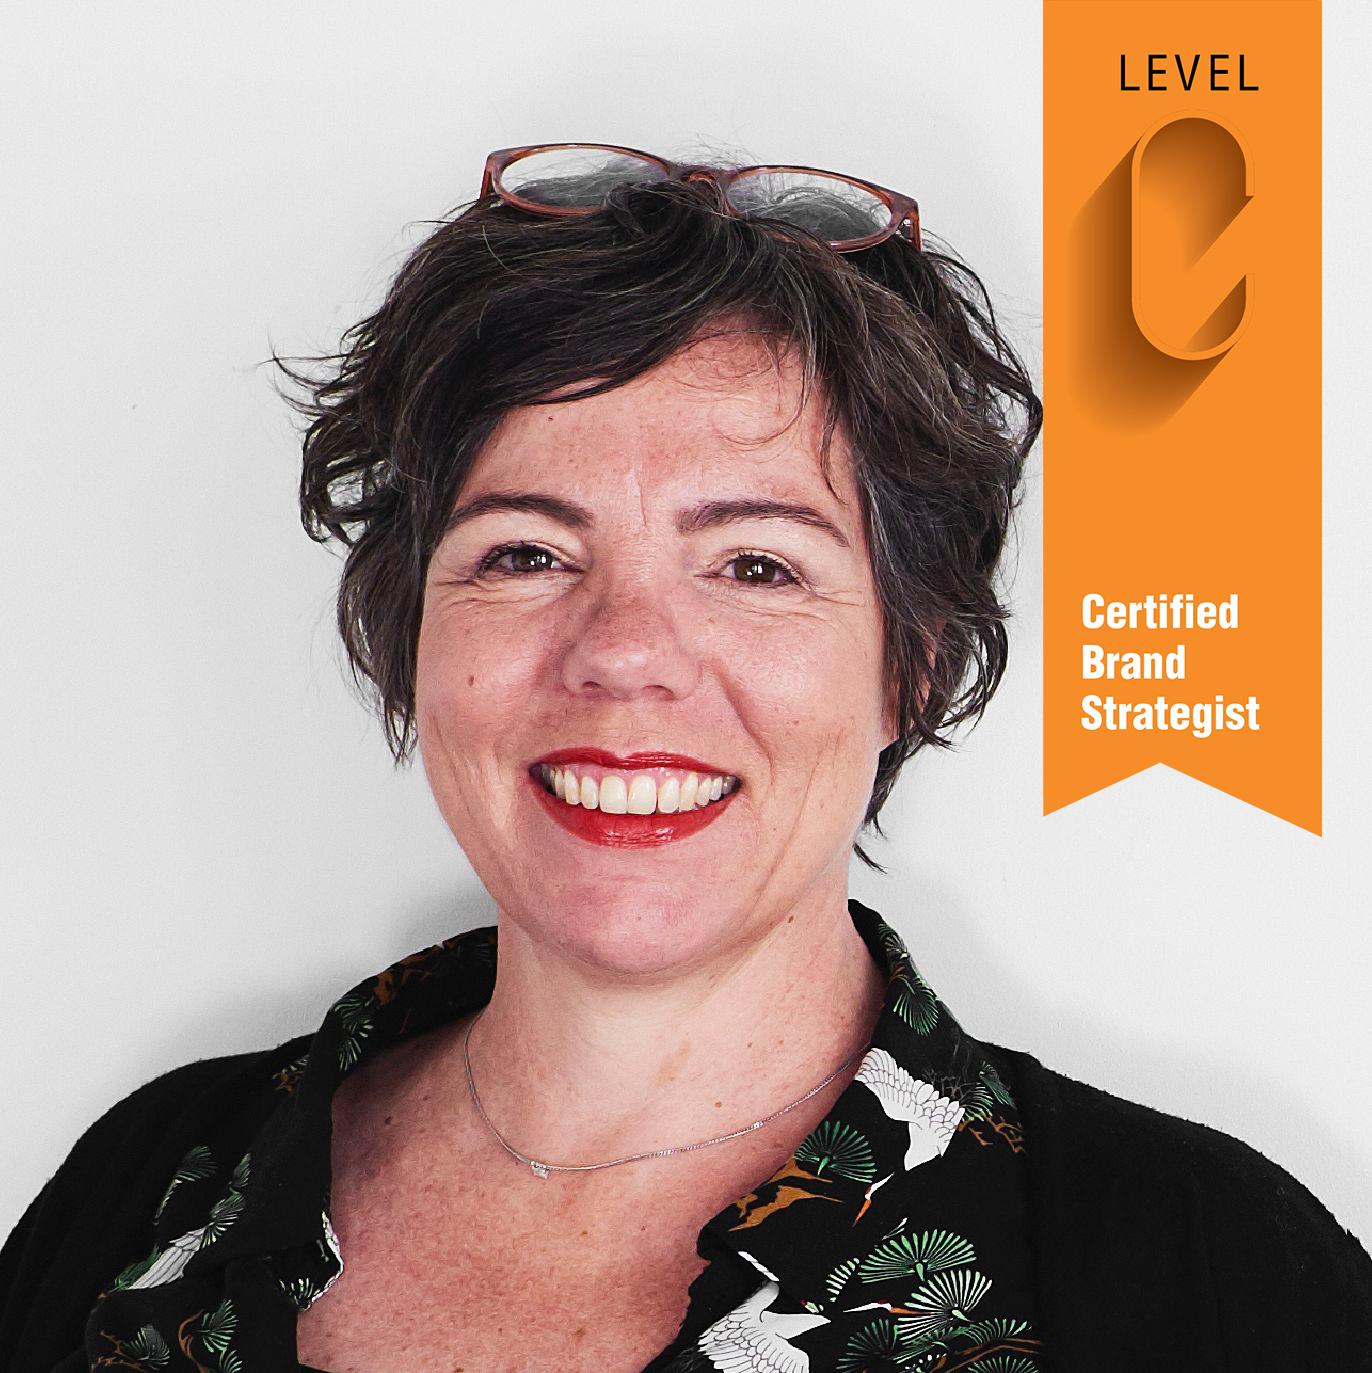 Portrait image with Level C Certification